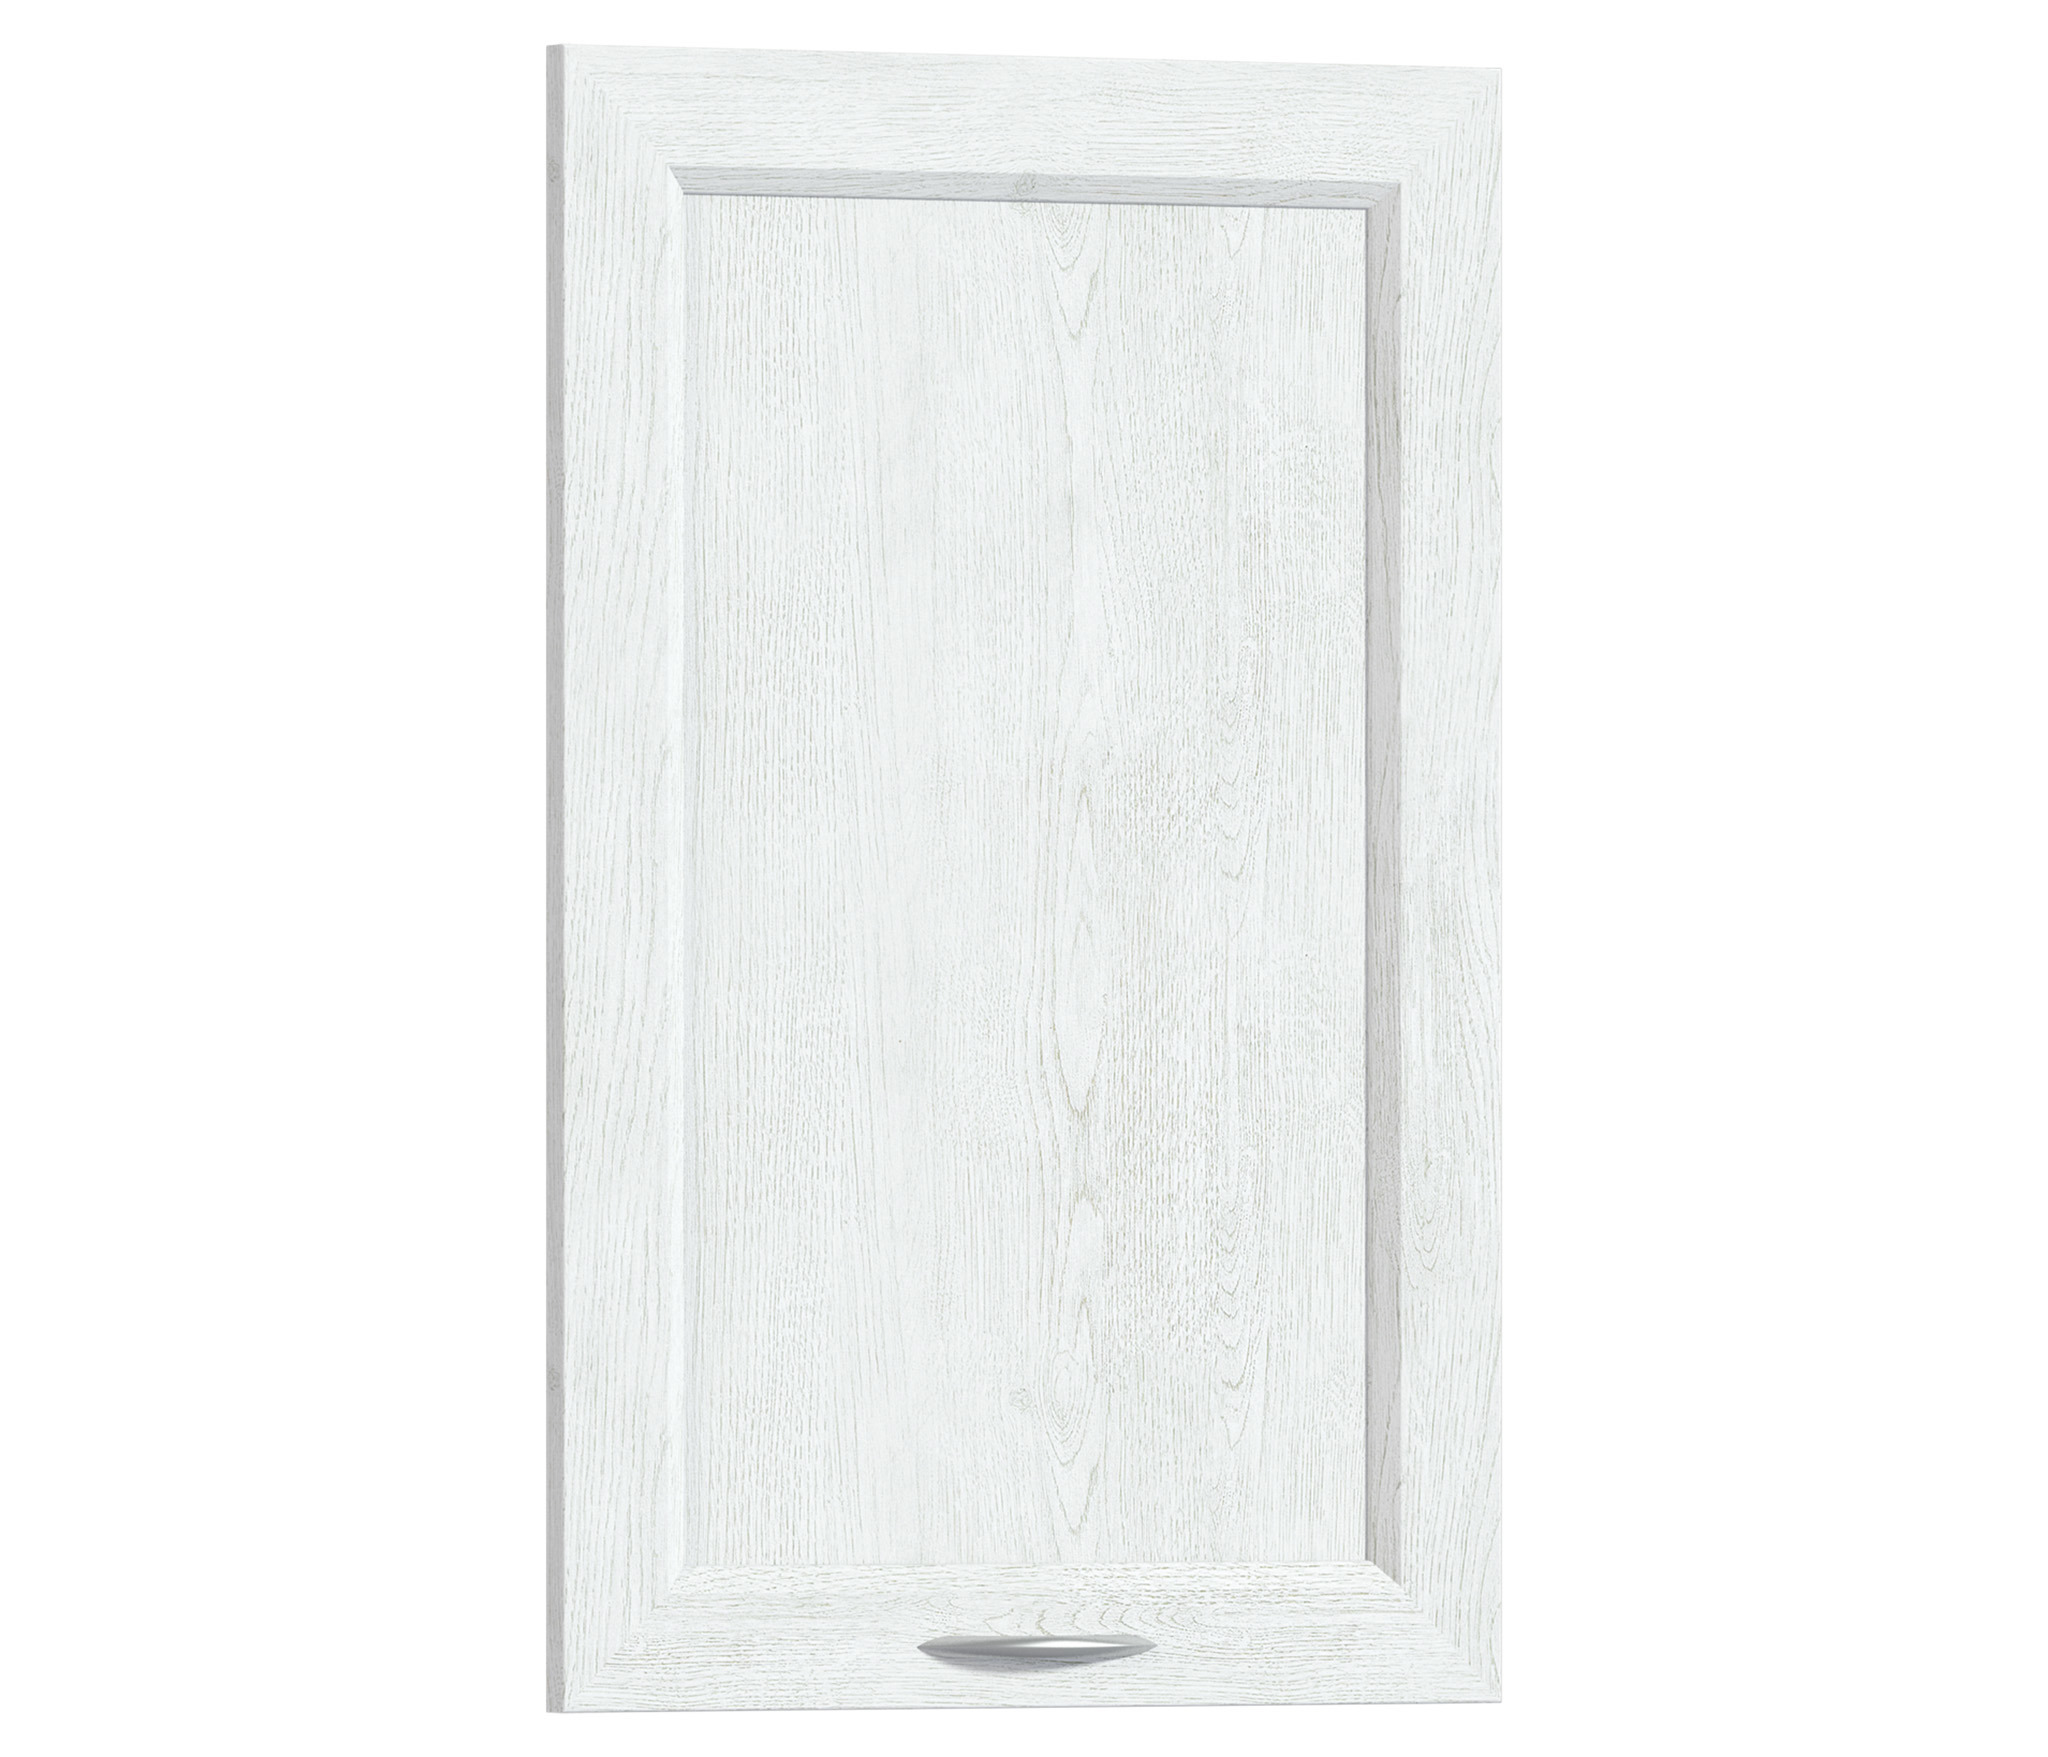 Фасад Регина Ф-160 к корпусу РП-160Мебель для кухни<br>Прочная дверца для подвесного шкафа.<br><br>Длина мм: 596<br>Высота мм: 920<br>Глубина мм: 22